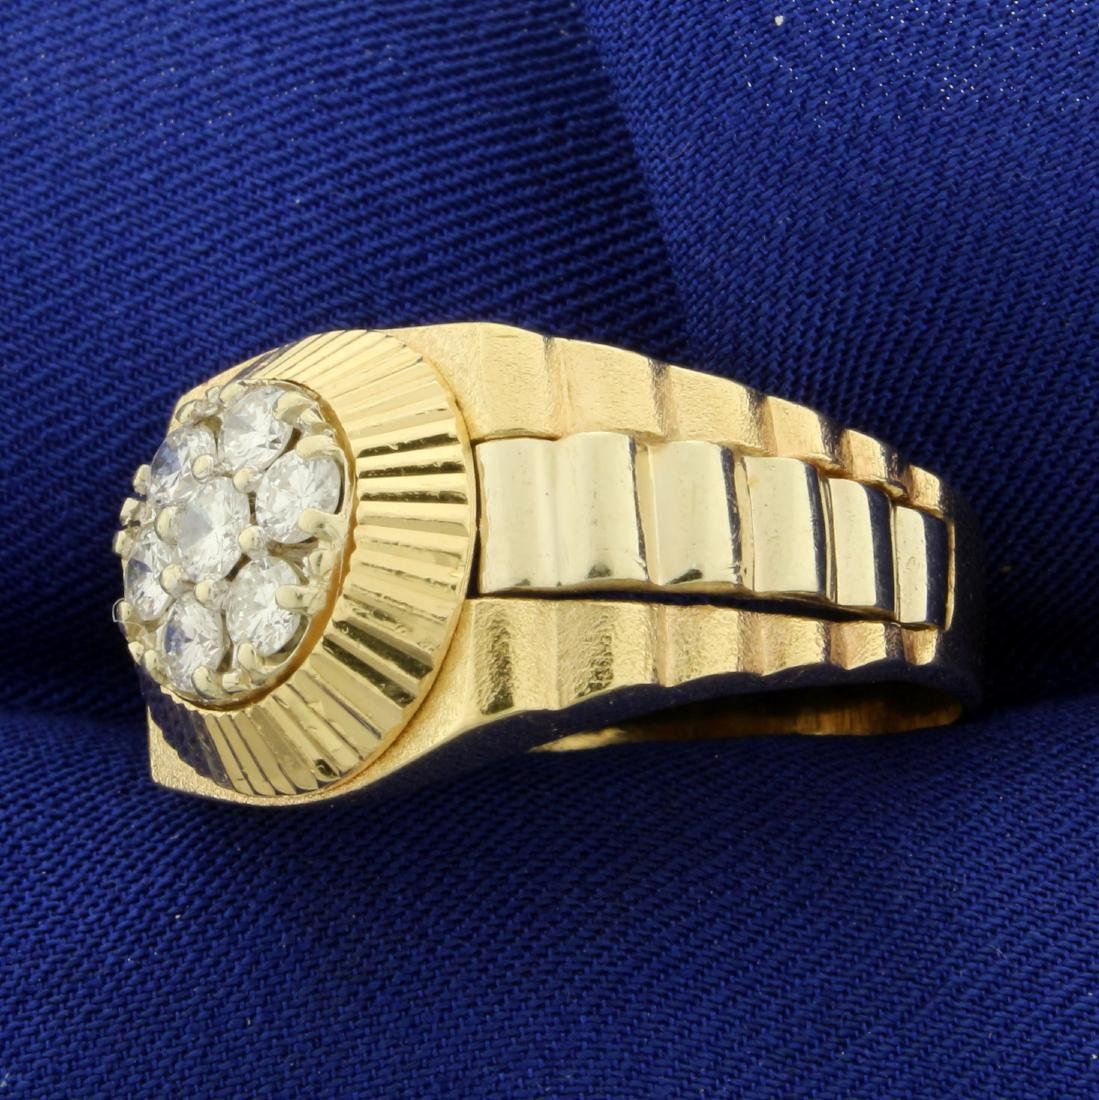 1ct TW Men's Diamond Ring in 14K Yellow Gold - 2